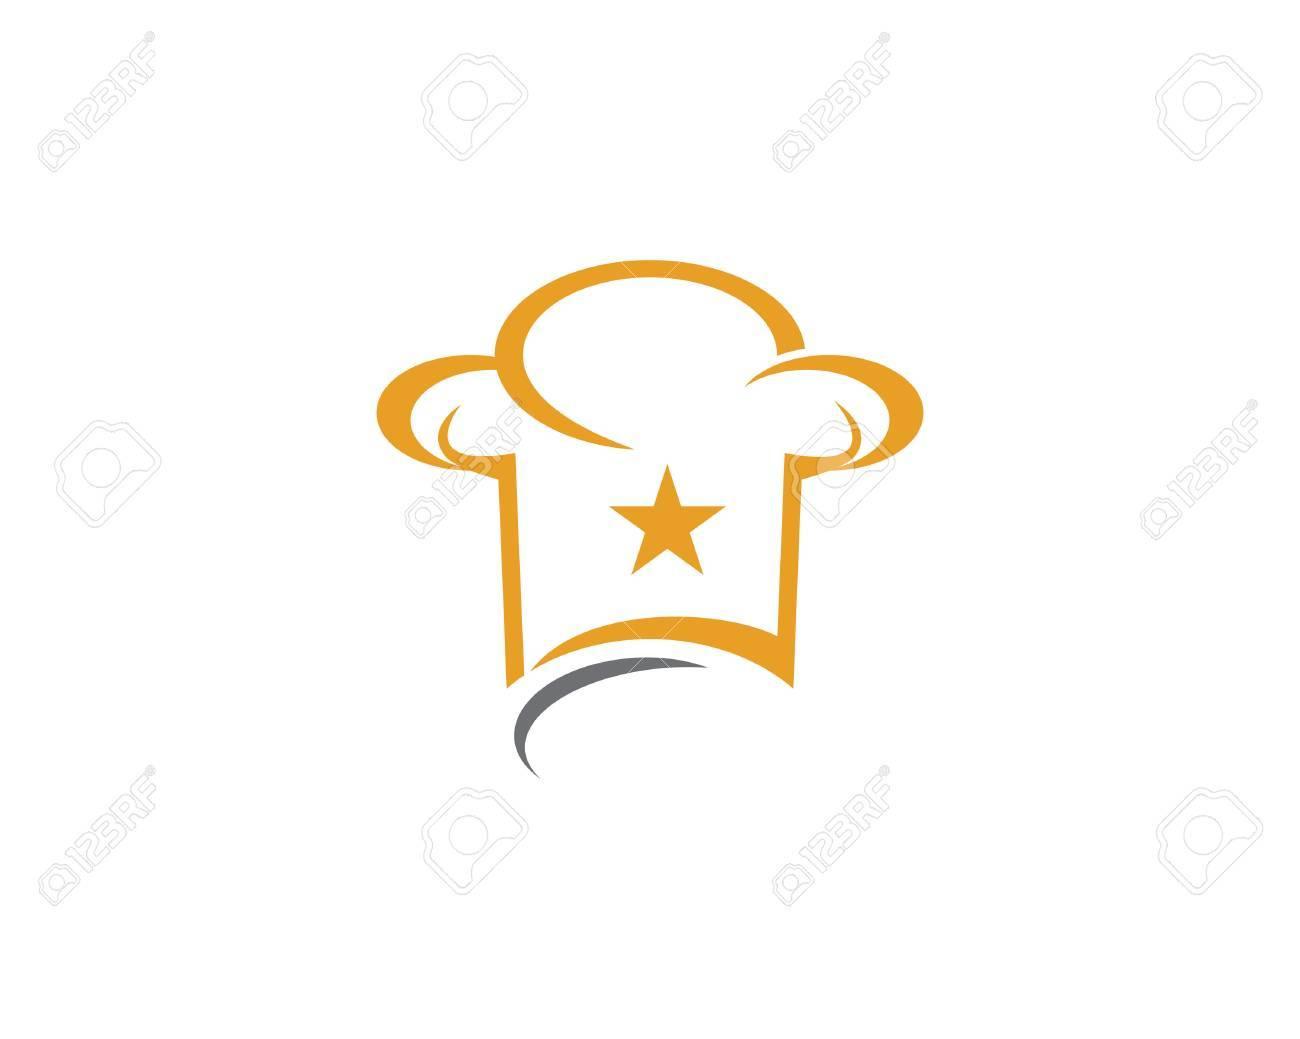 Chef logo template vector icon - 75878250